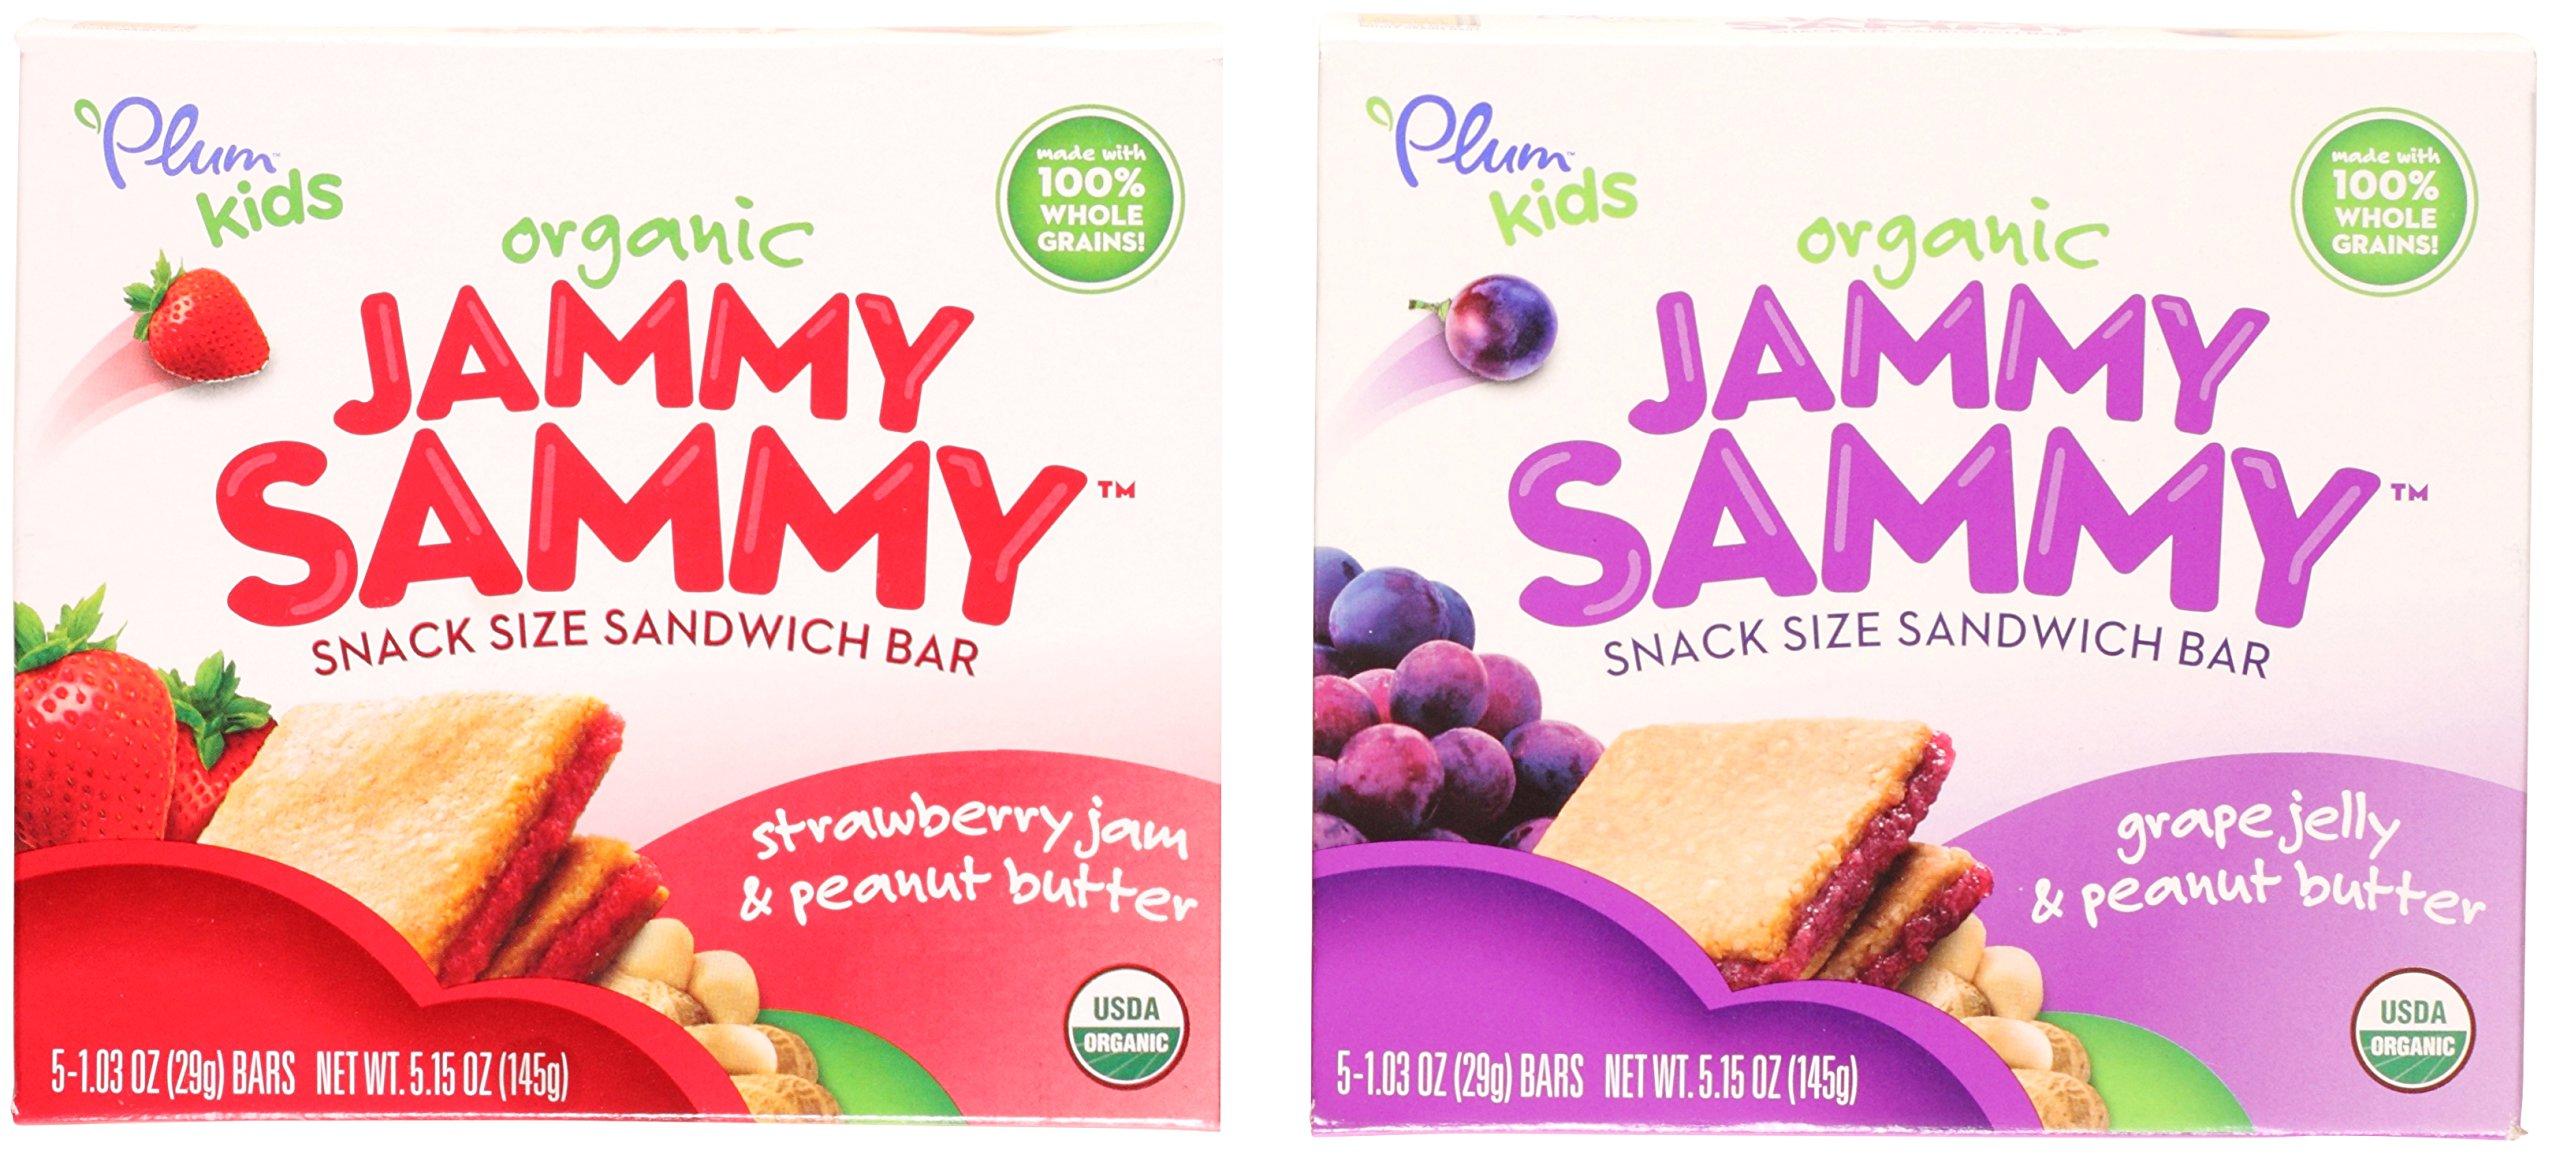 Plum Organics Kids Jammy Sammy Sandwich Bar Variety Bundle: (1) Strawberry Jam & Peanut Butter 5.15oz and (1) Grape Jelly & Peanut Butter 5.15oz (2 Pack Total)